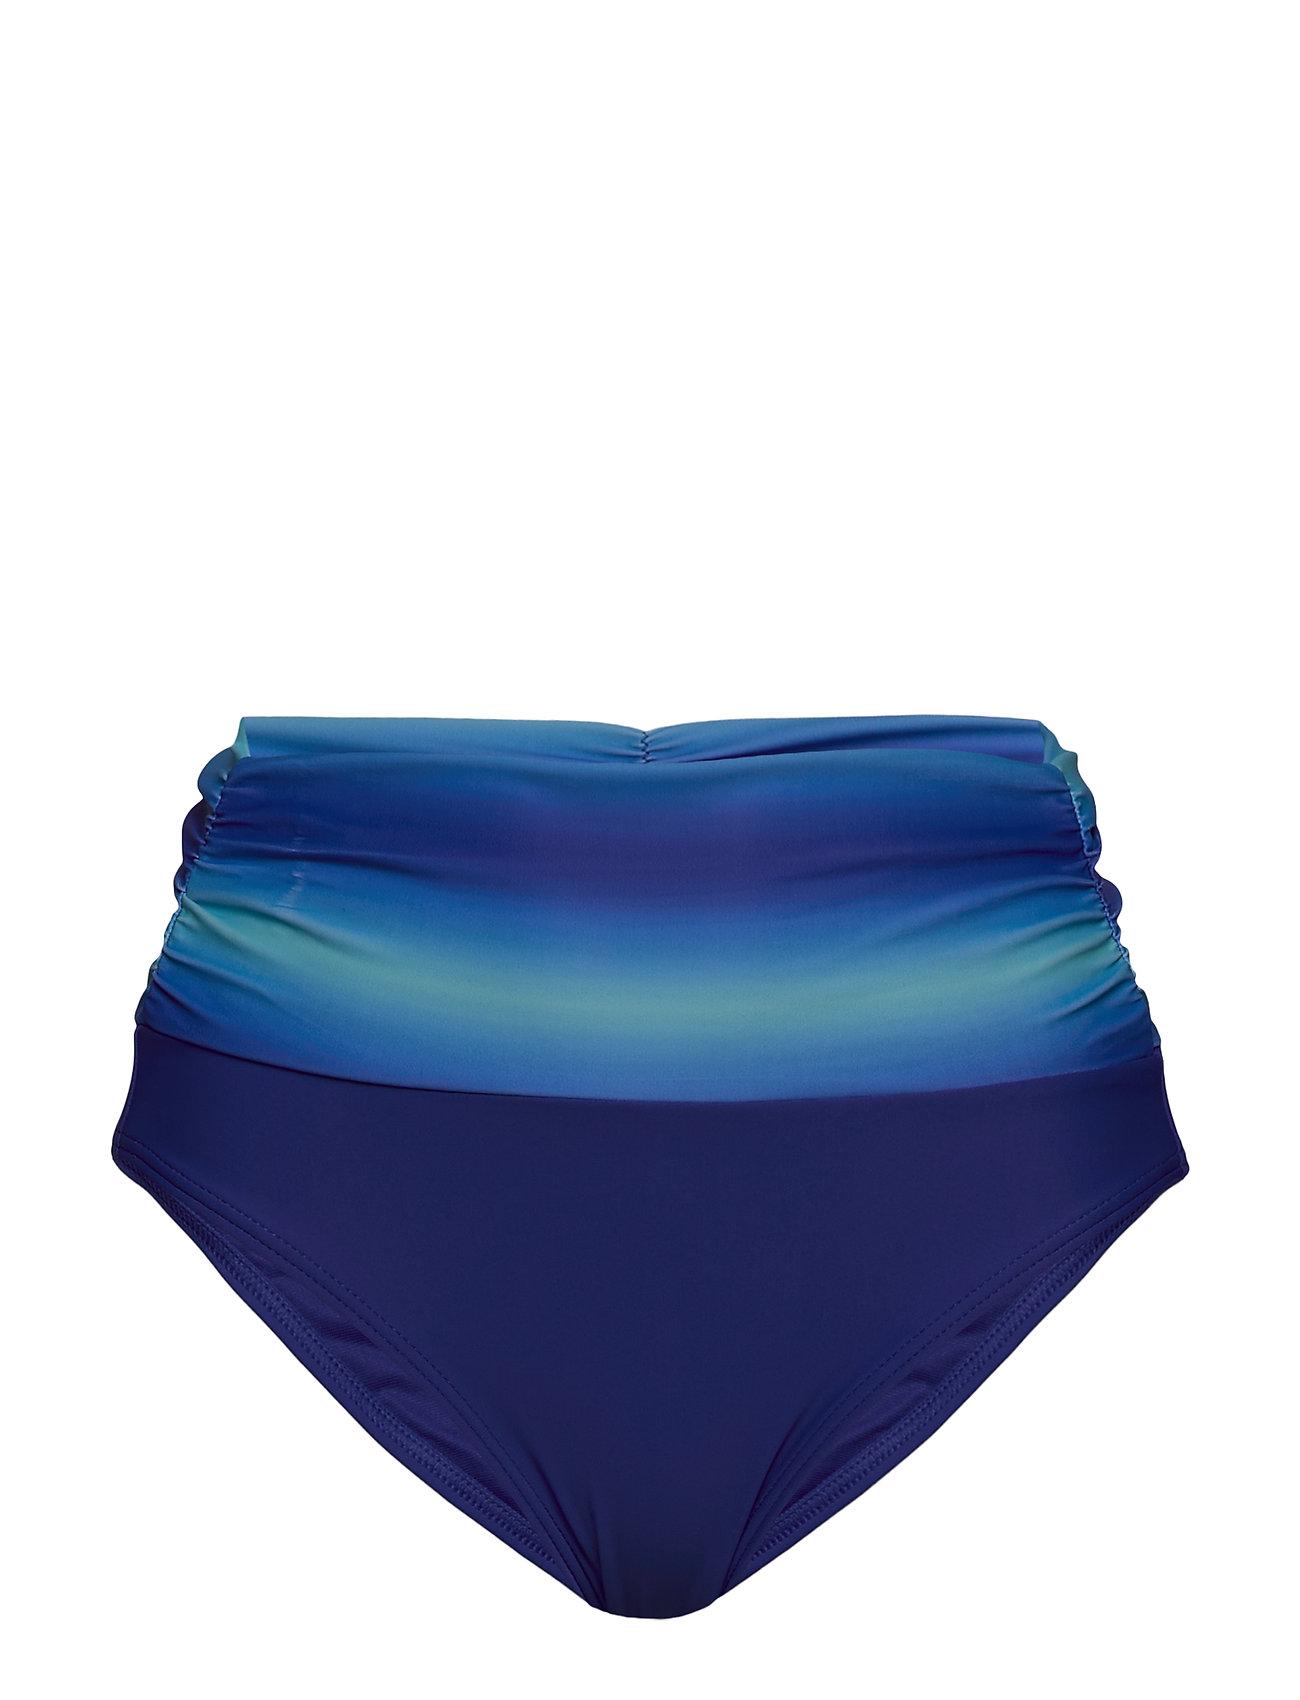 Image of Swim Tai De Luxe Bikinitrusser Blå Wiki (3406250813)